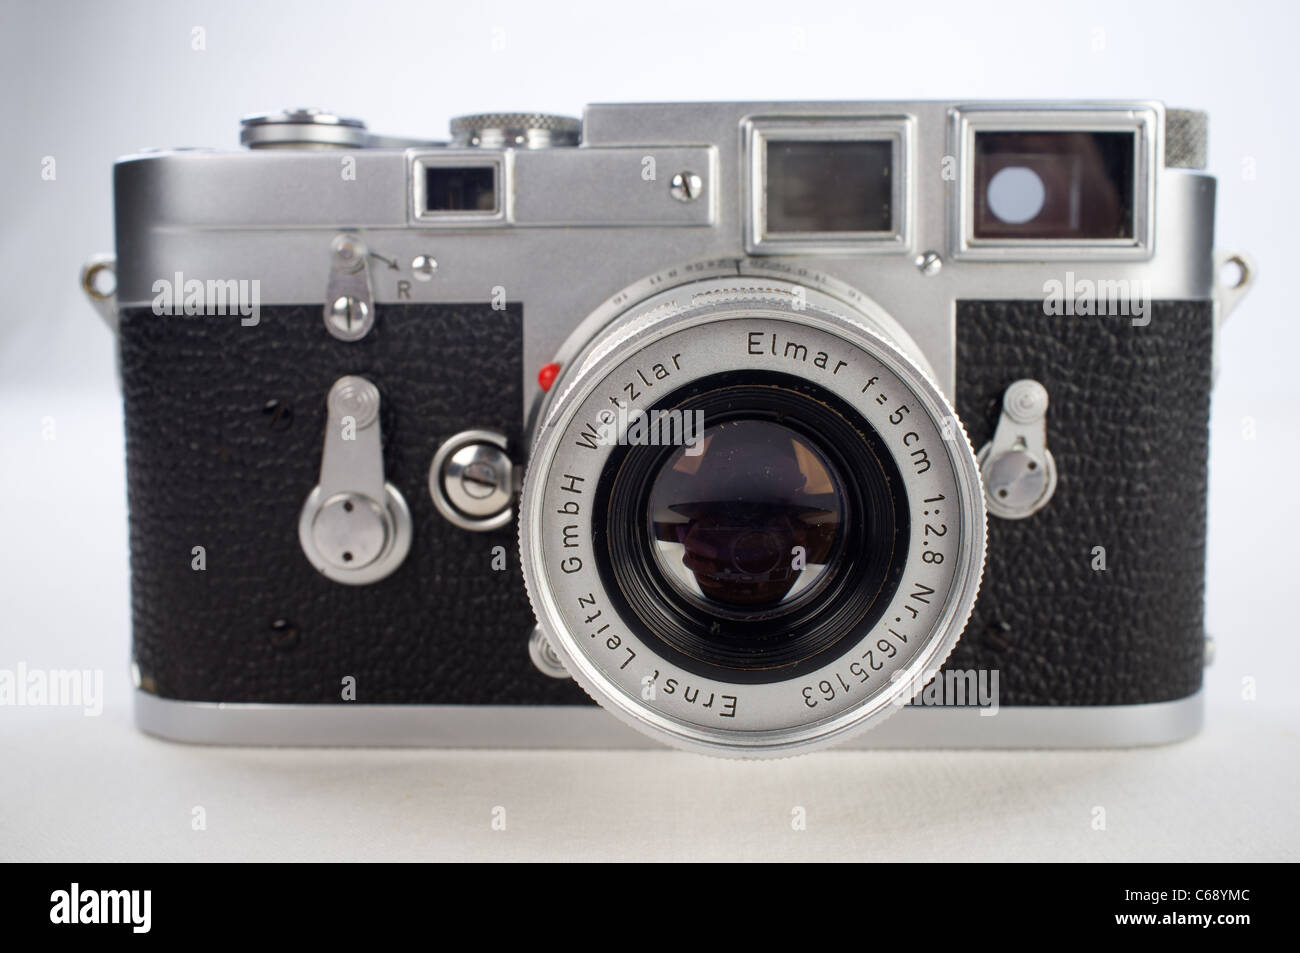 Leica Oder Zeiss Entfernungsmesser : Leica filmkamera stockfotos bilder alamy